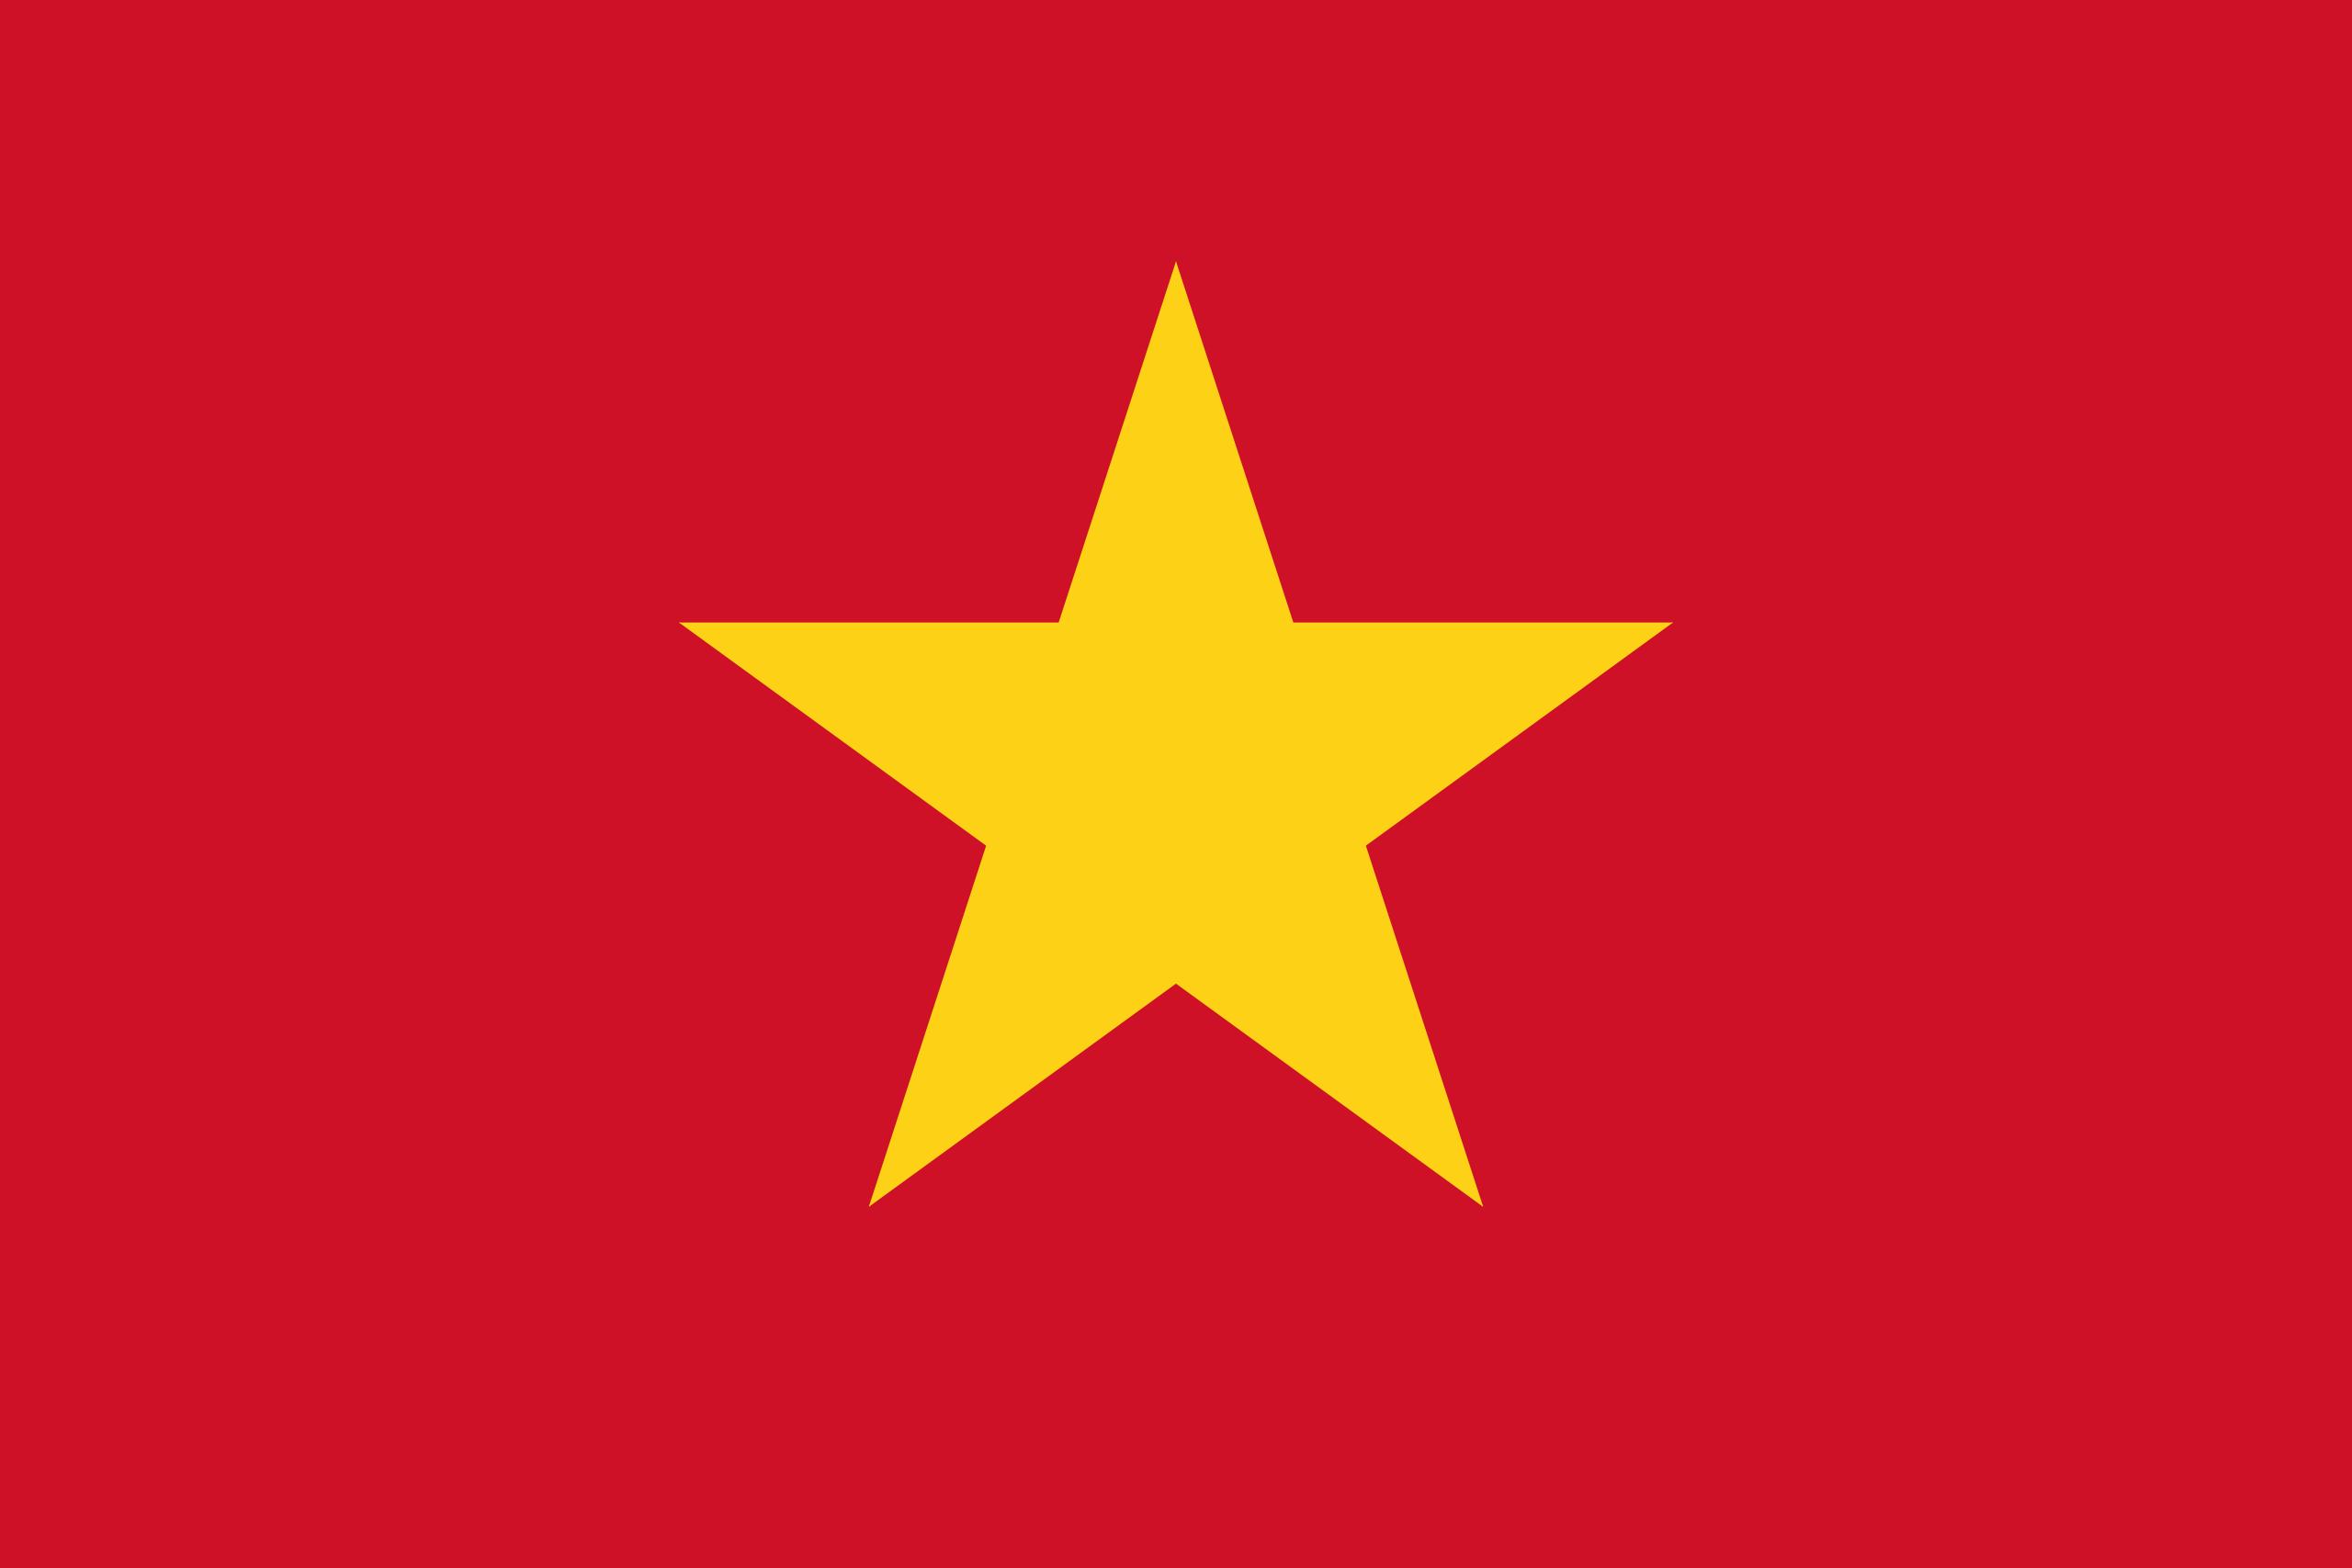 vietnam, país, emblema, insignia, प्रतीक - HD वॉलपेपर - प्रोफेसर-falken.com